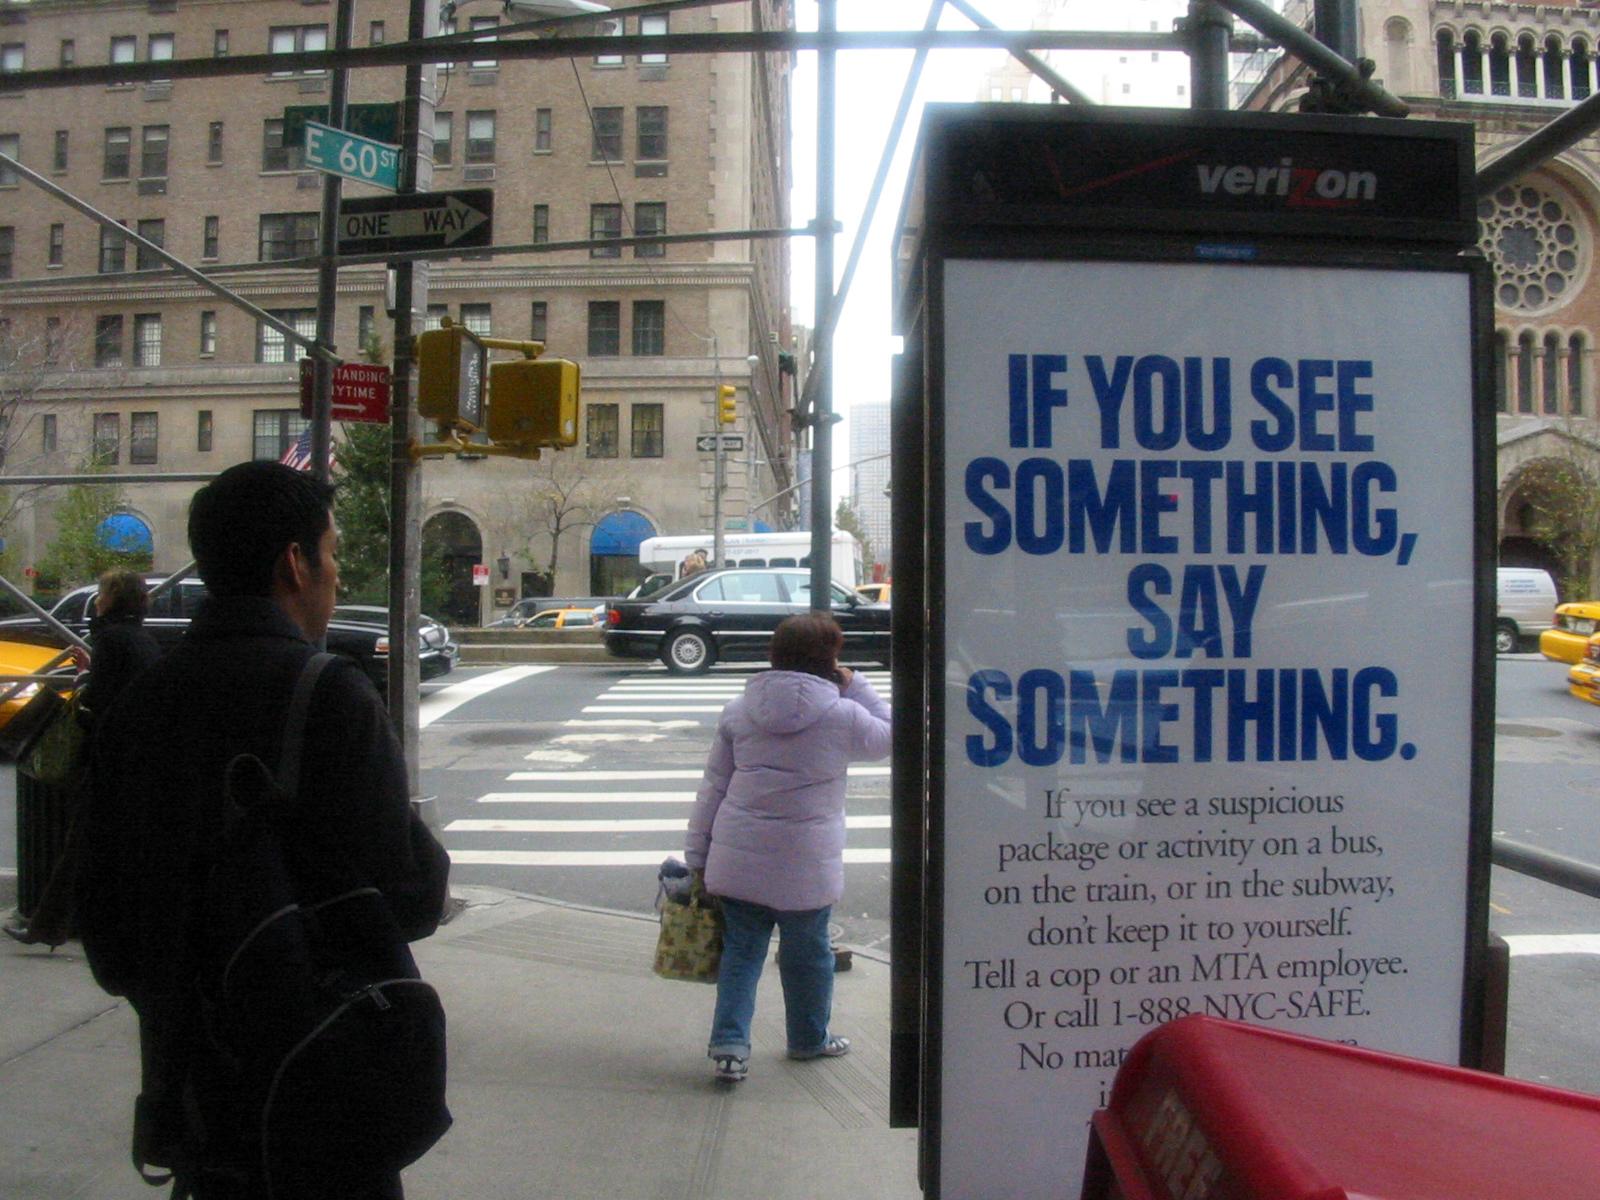 60th & Park Ave, New York City